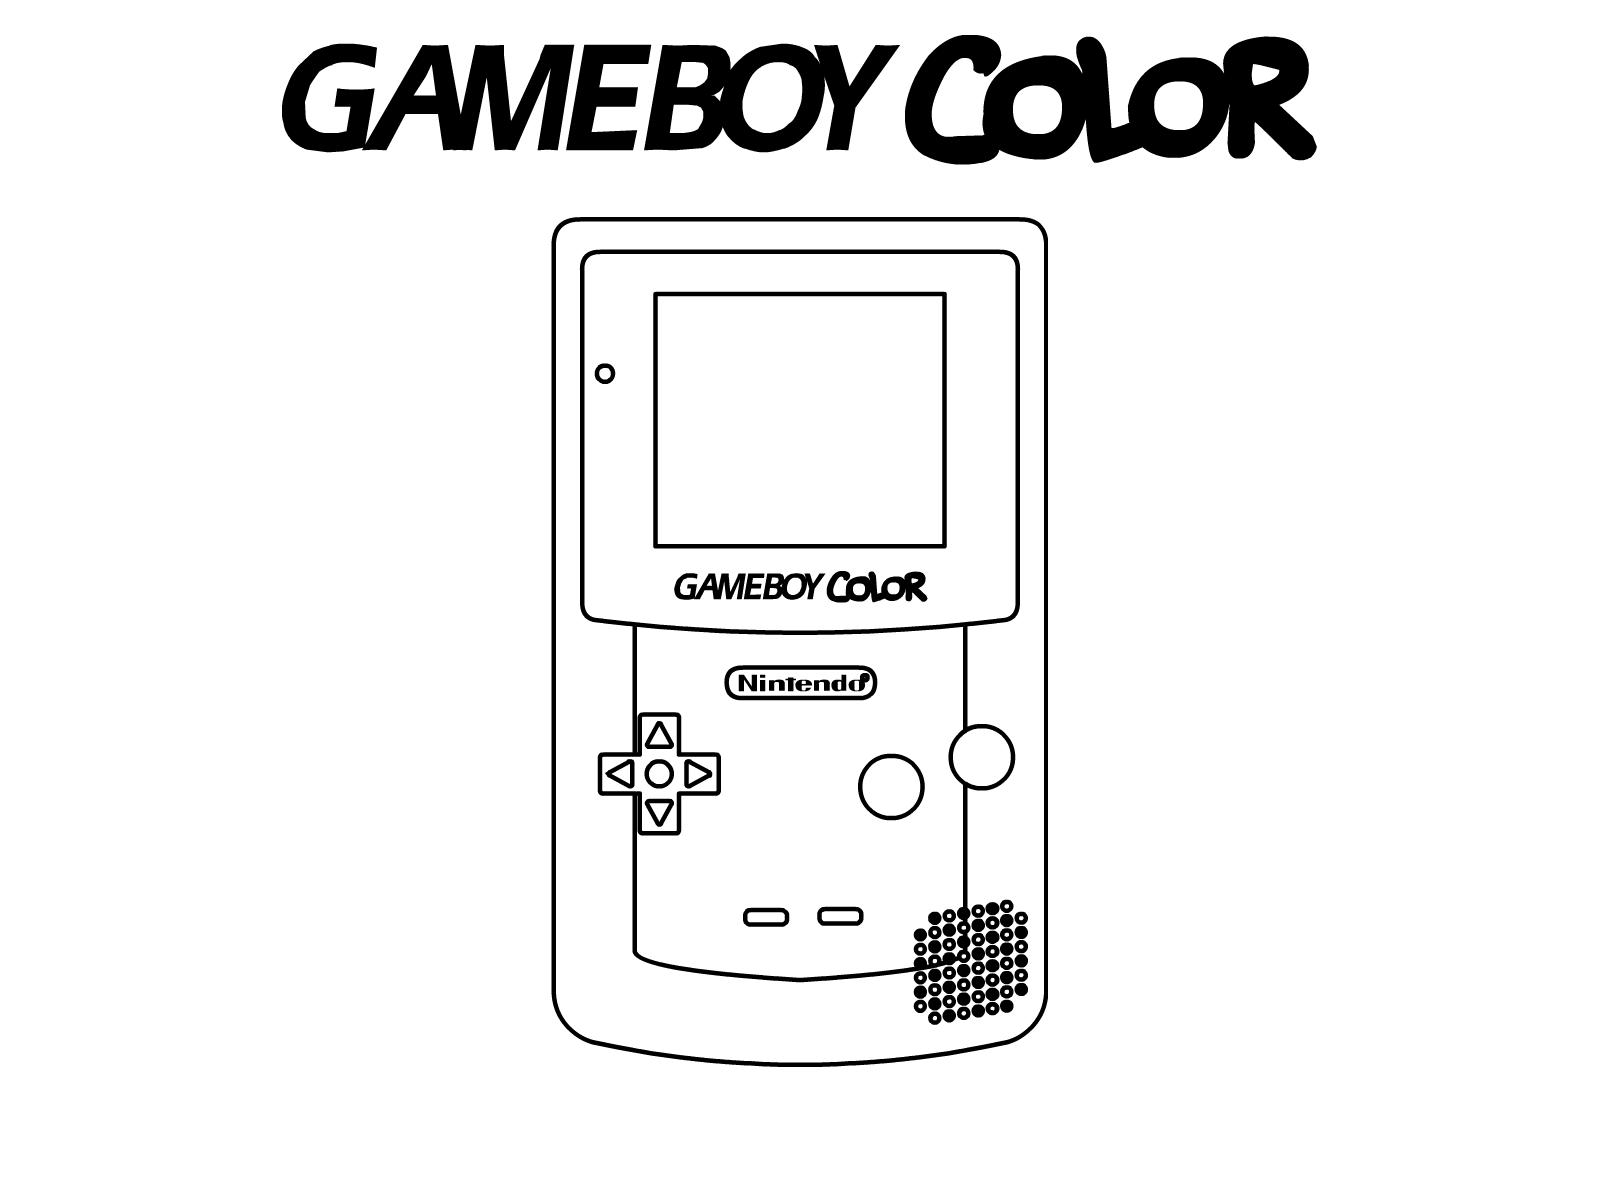 Game boy color palette gimp - Game Boy Color Palette Gimp 15